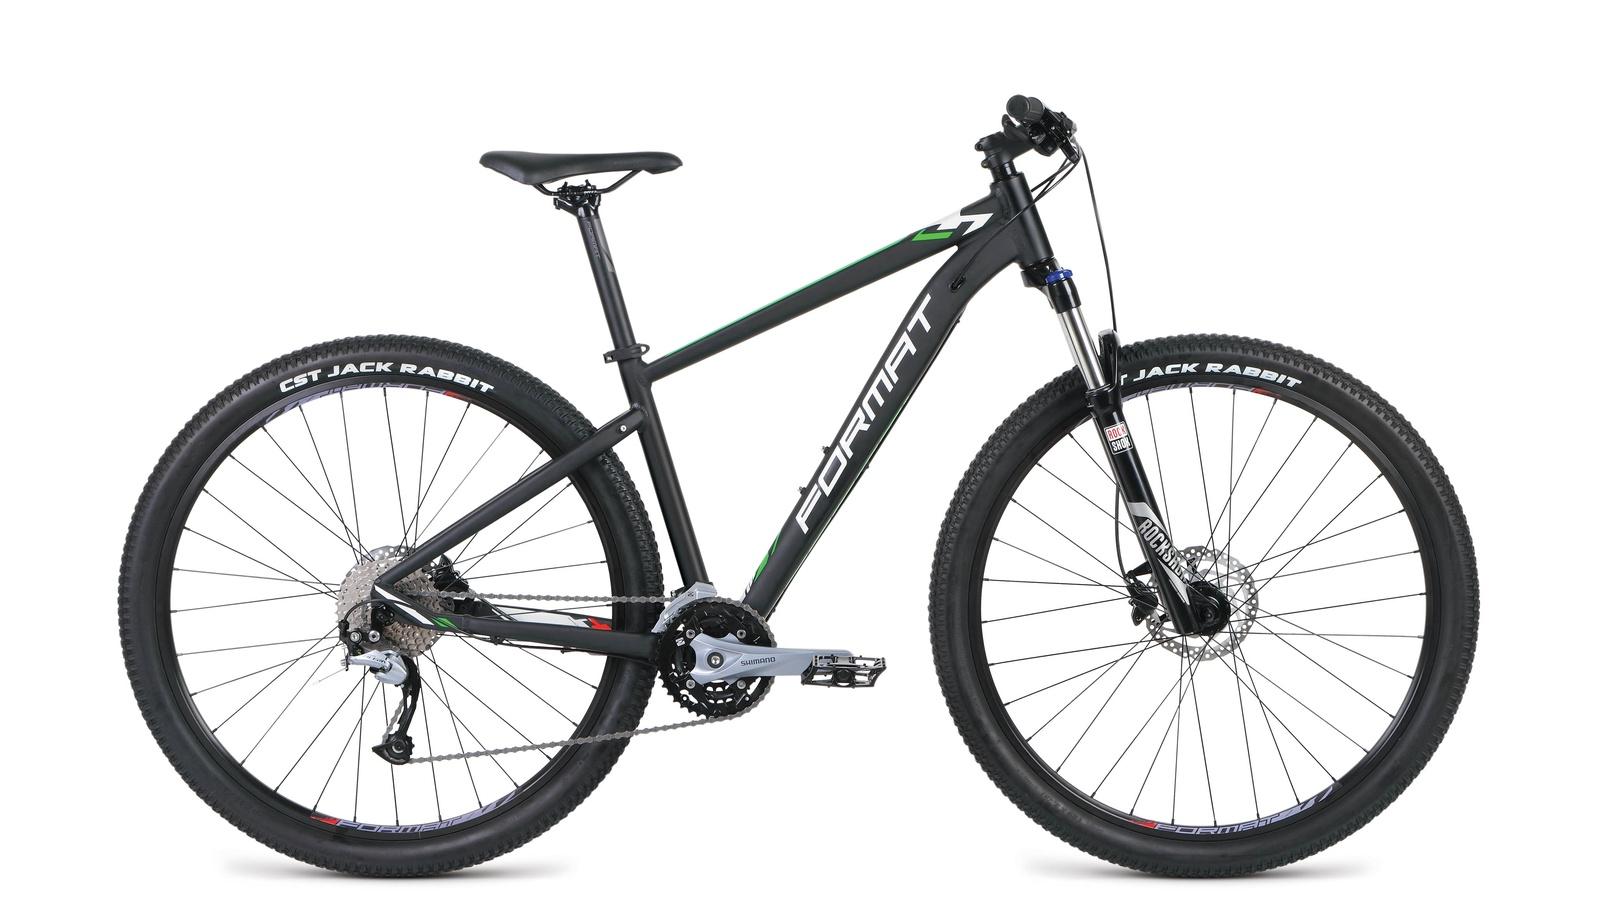 Велосипед Format RBKM9M69S004, черный велосипед format 1113 2014